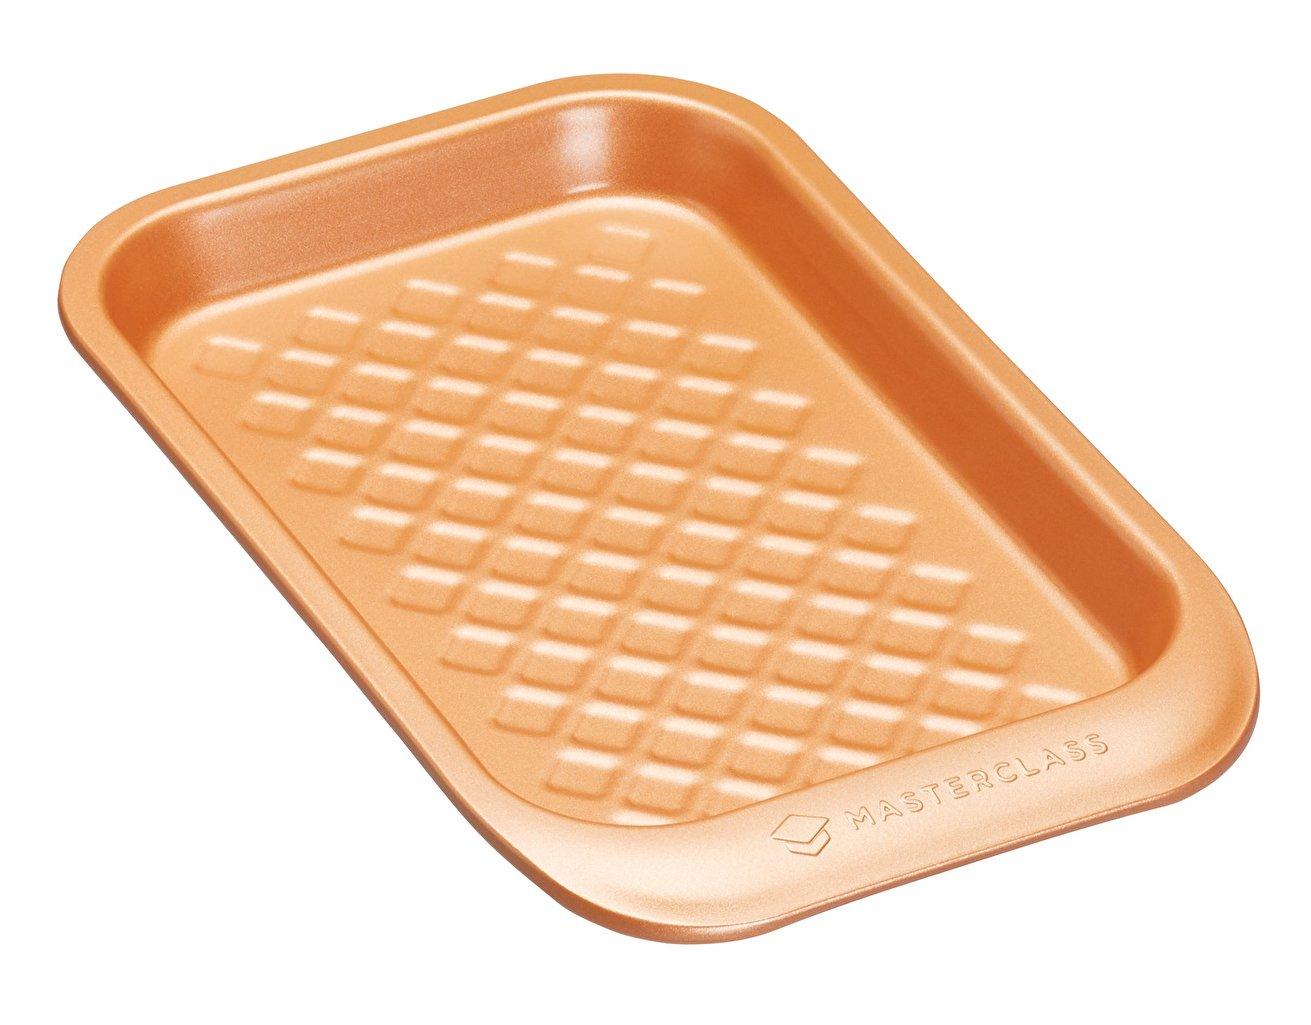 Möbel & Wohnen Kochen & Genießen Masterclass Smart Ceramic 42.5 X 31.5 Cm Heavy-duty Stackable Roasting Pan Set